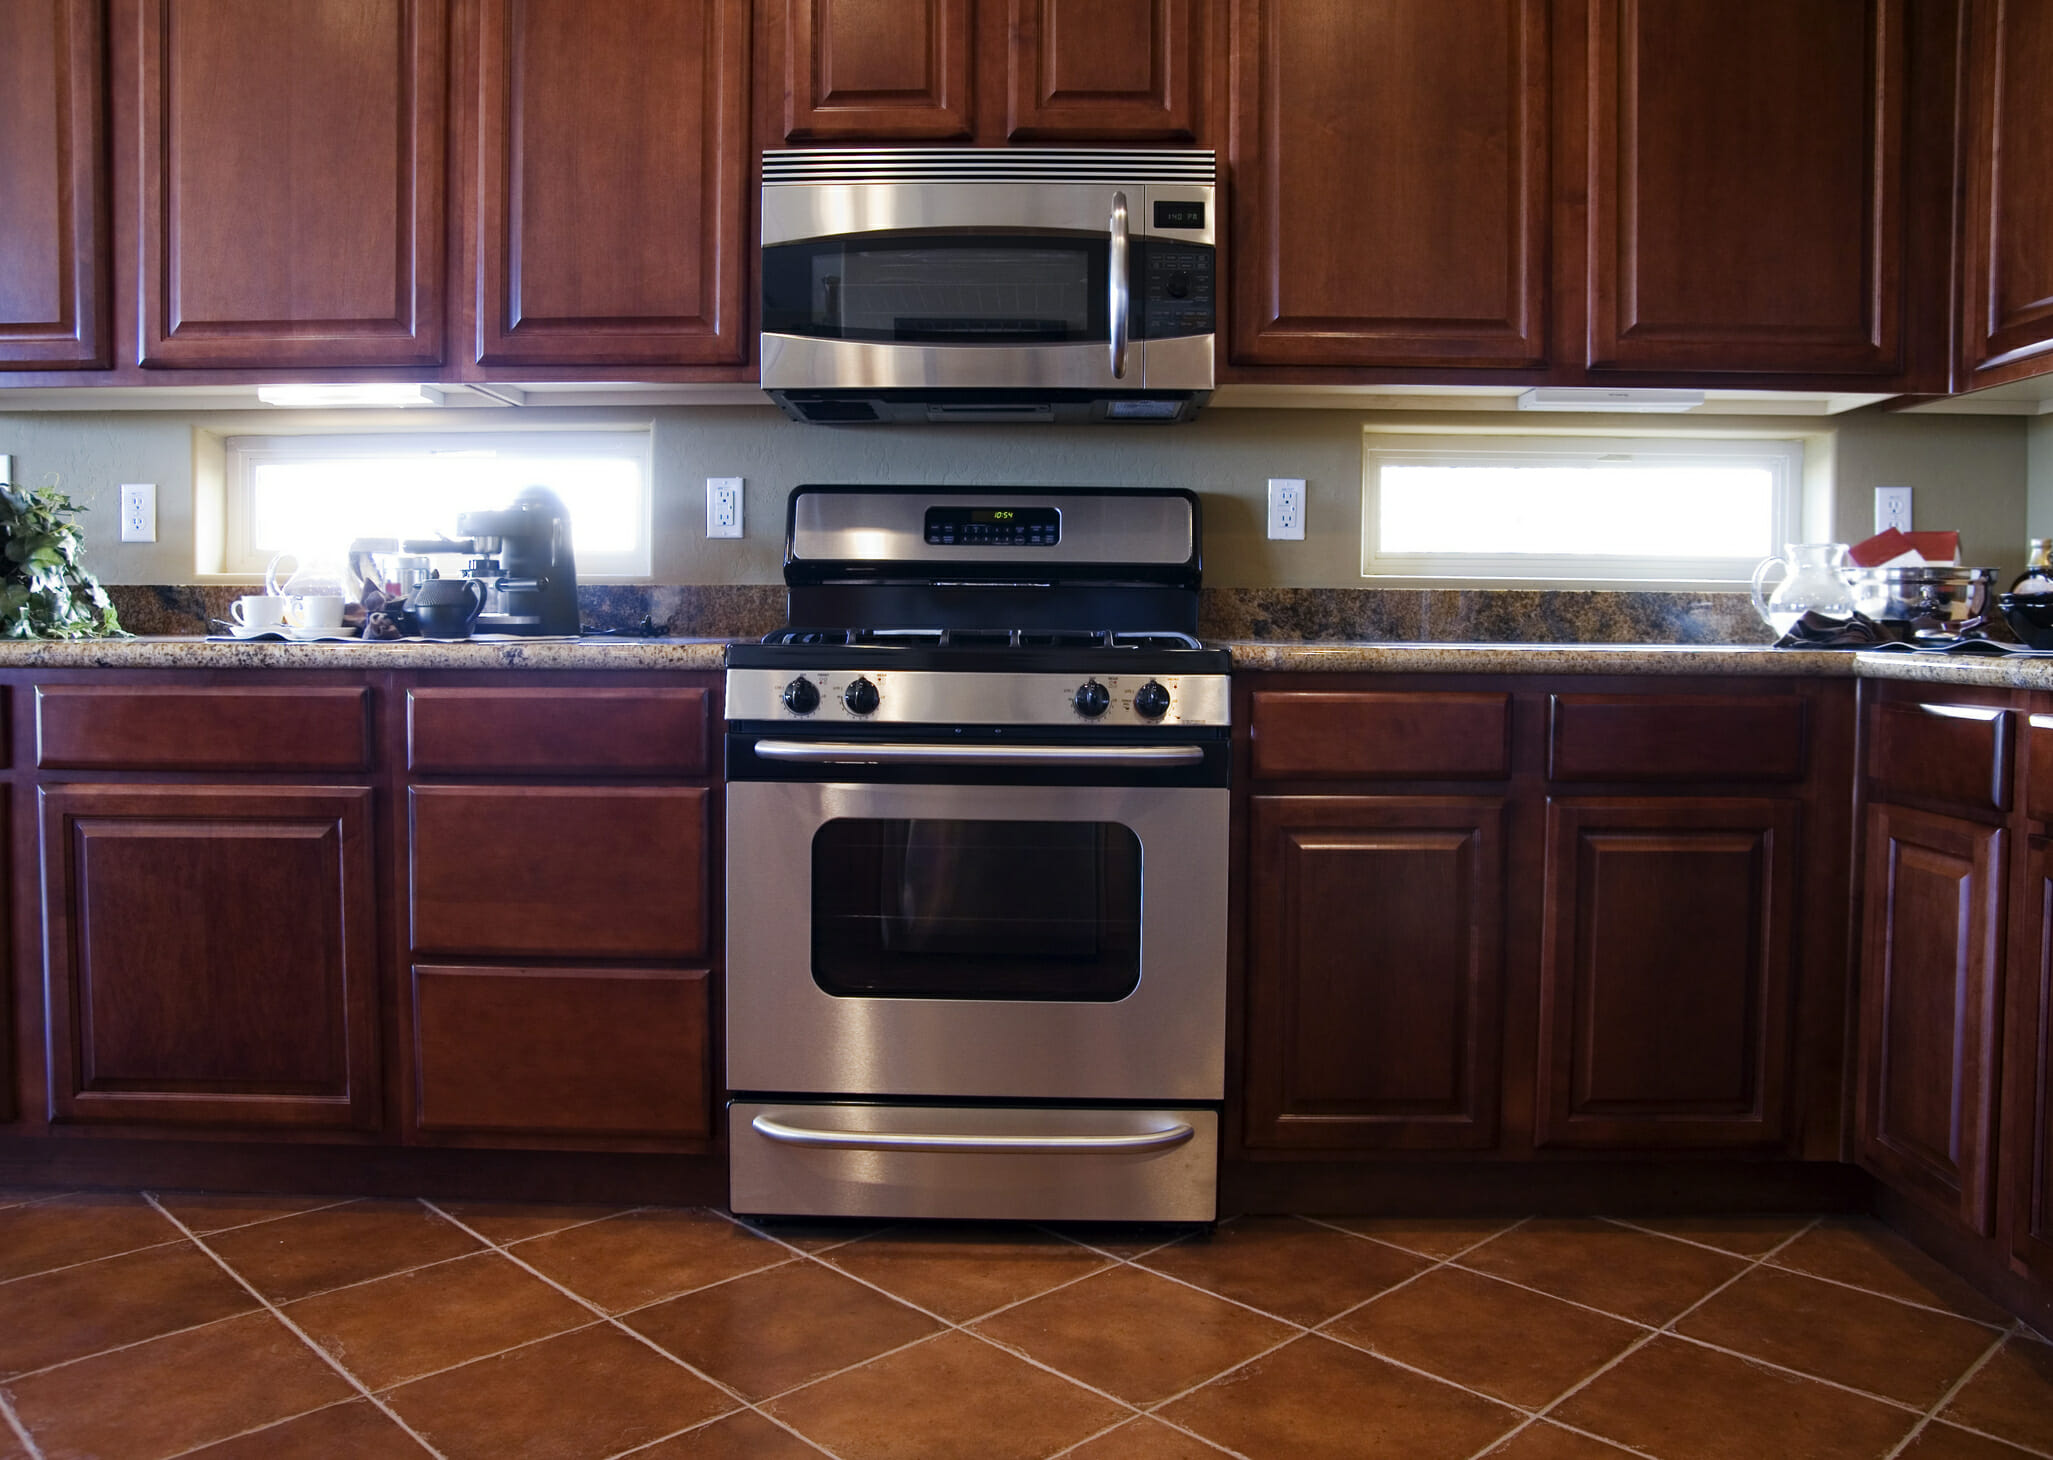 mahogany kitchen cabinets wallpaper backsplash modernize